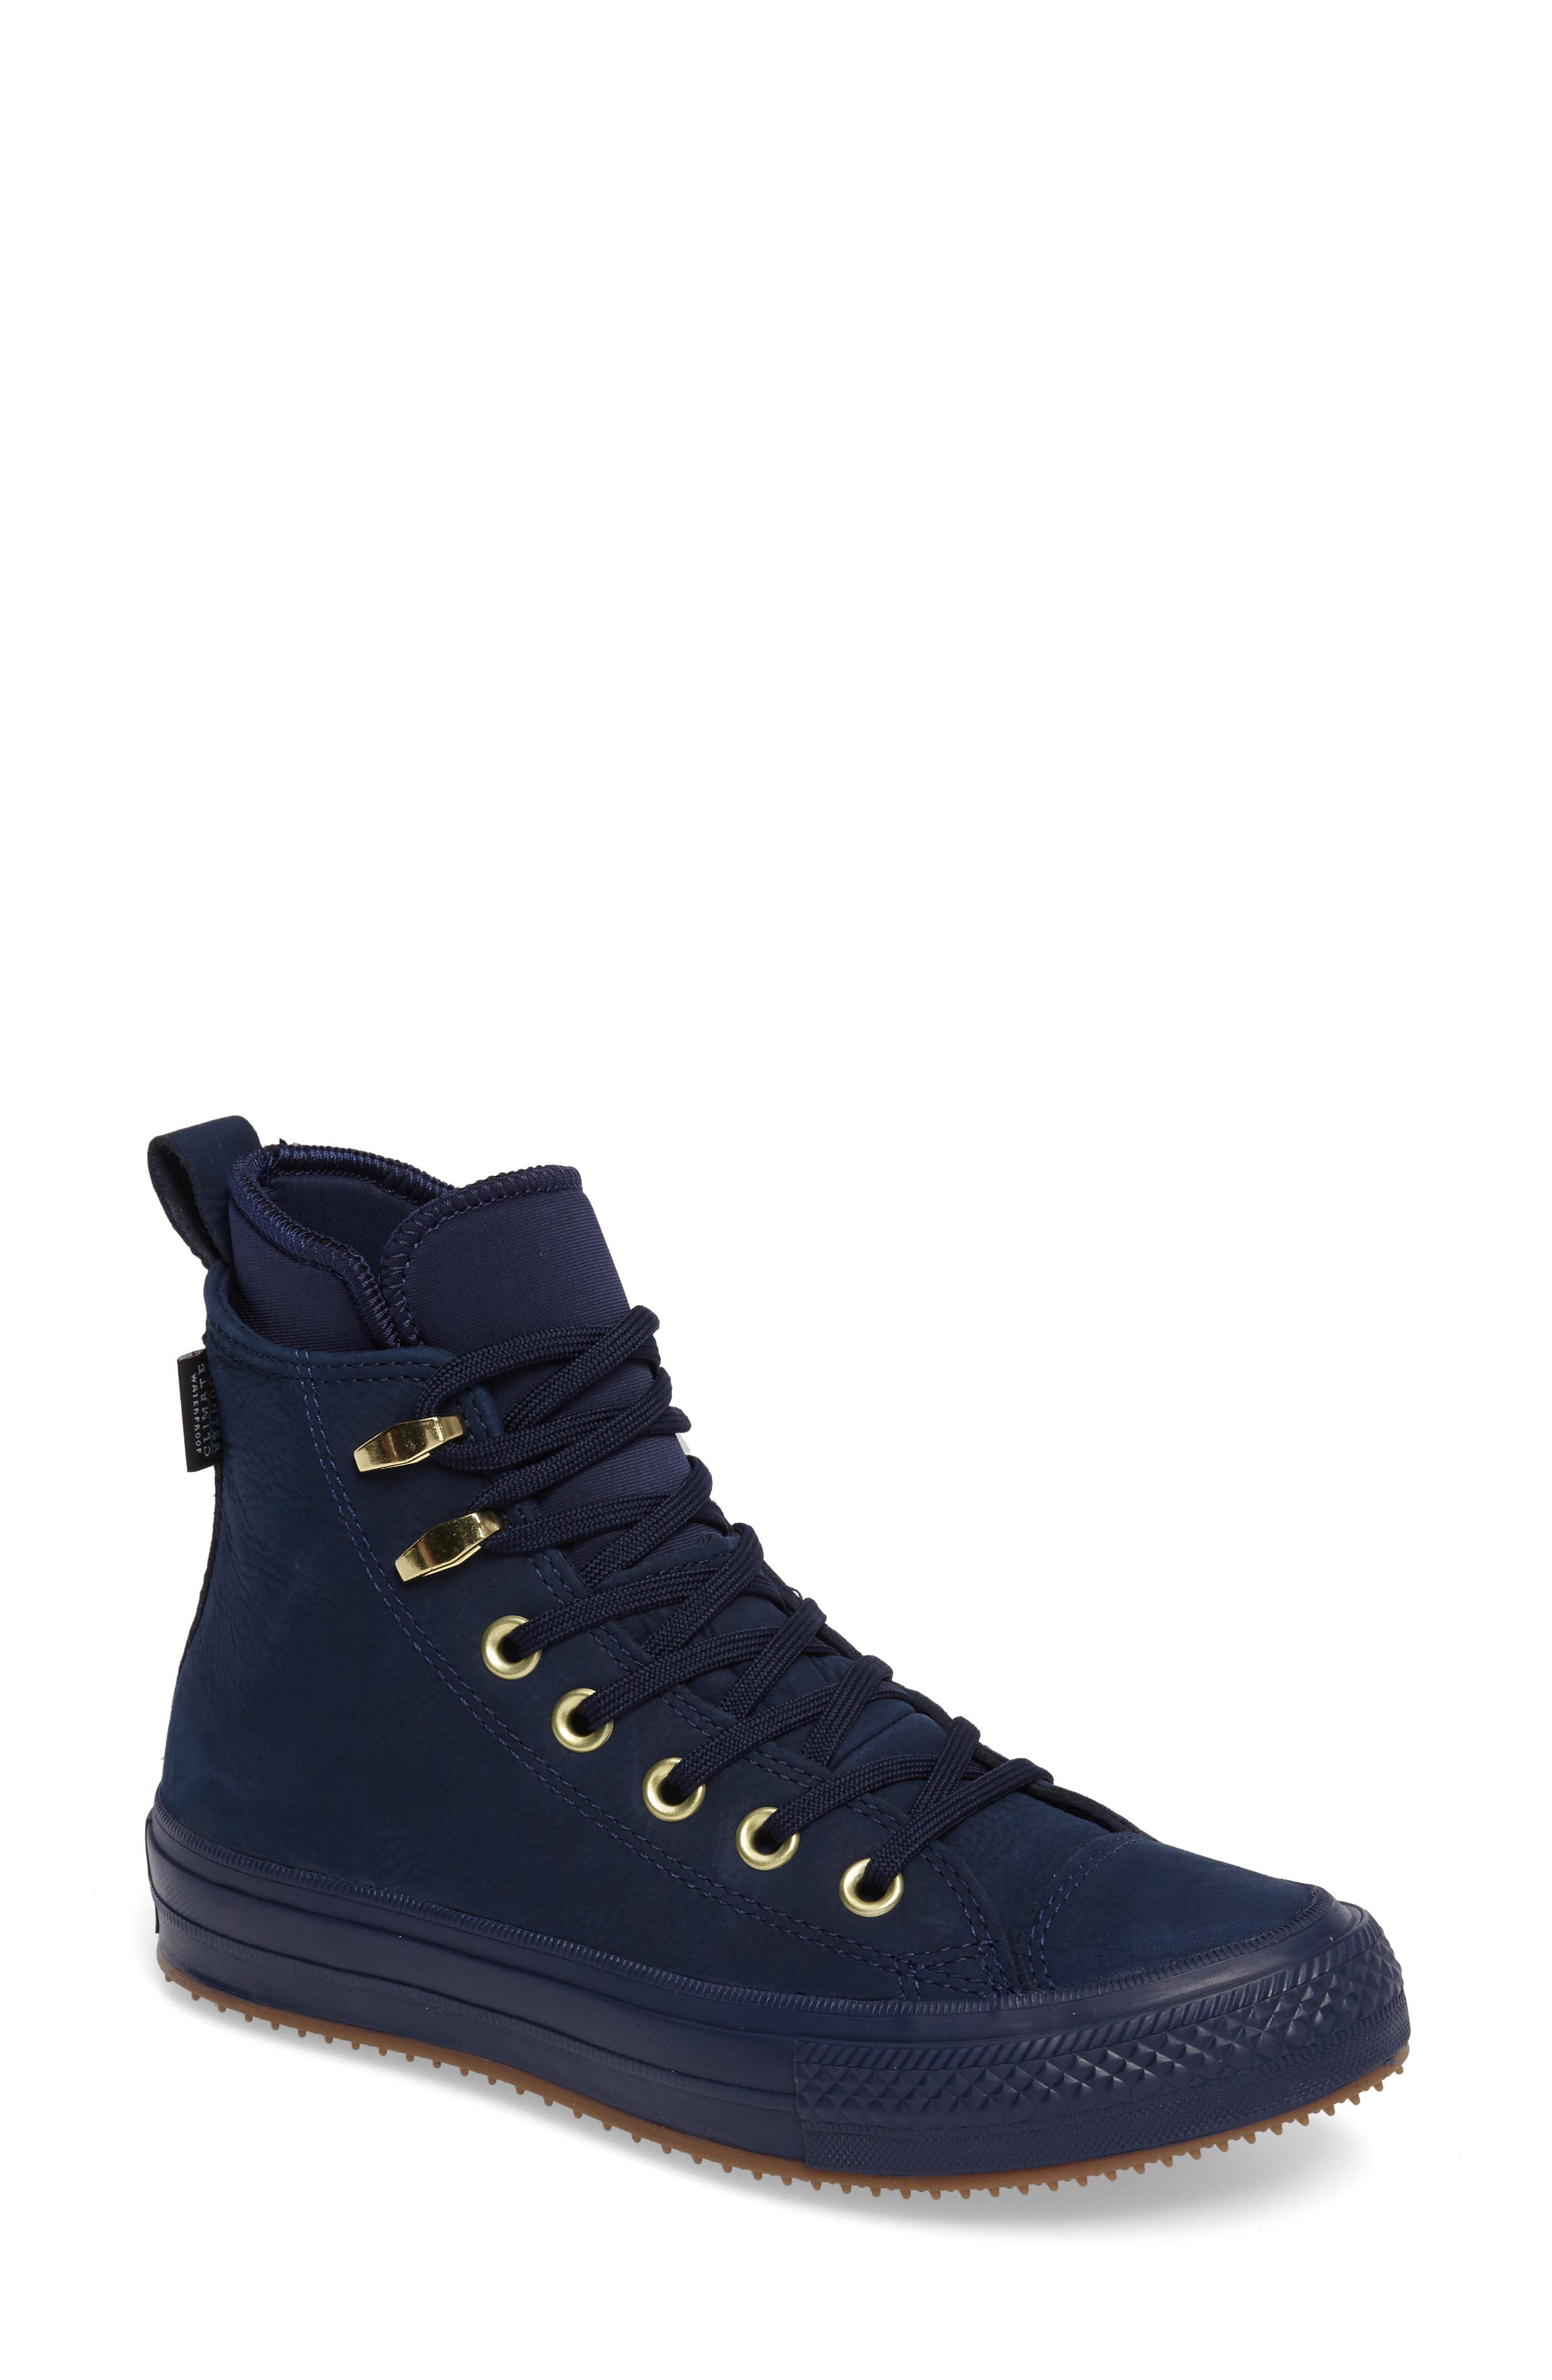 Converse Chuck Taylor® All Star® Waterproof Sneaker Boot (Women)